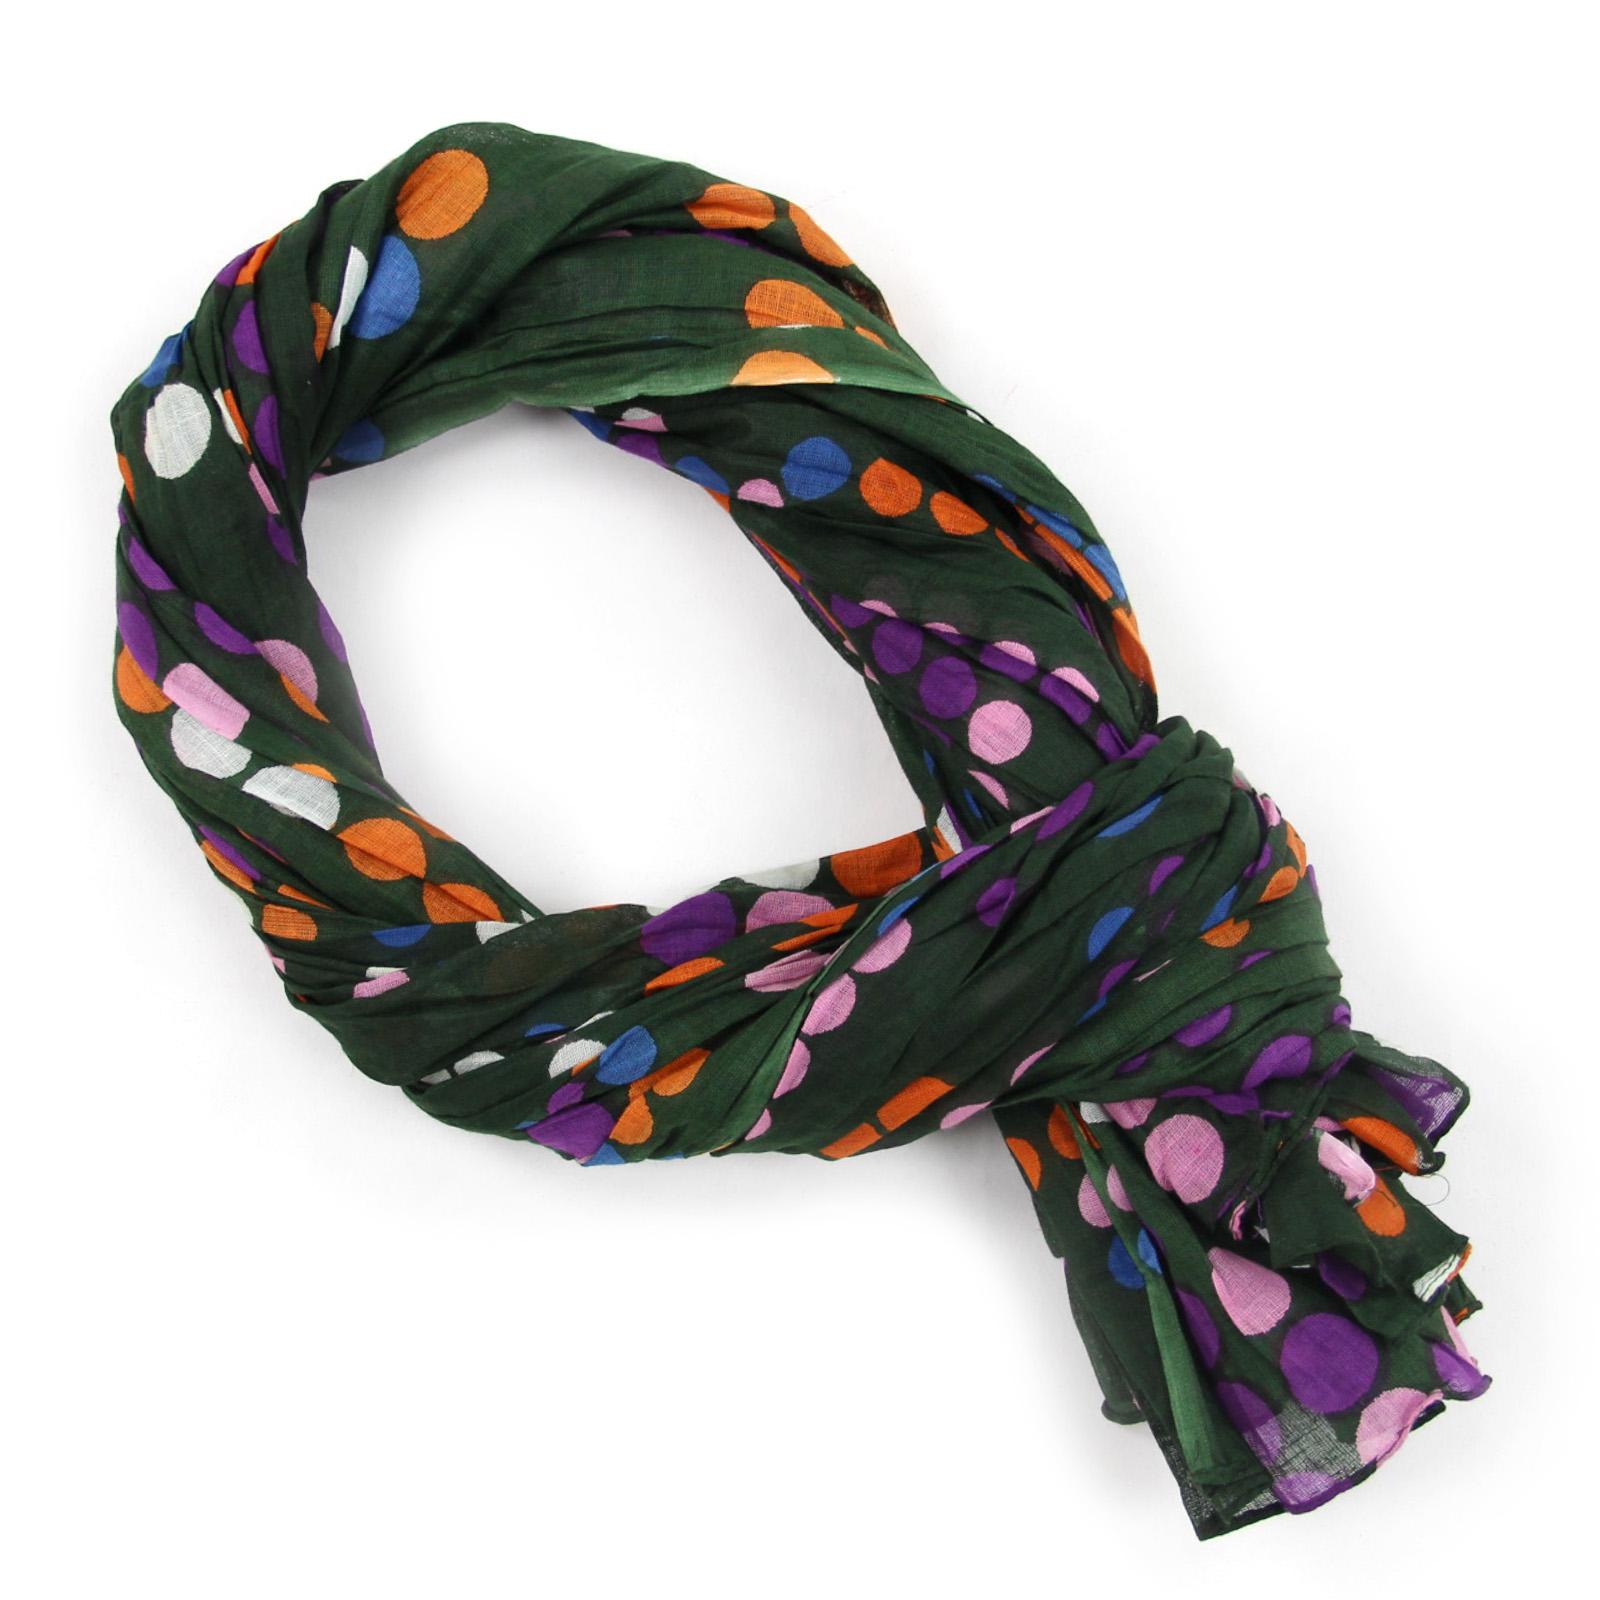 e8ae8f94490 foulard-cheche-coton-pois-vert-AT-02046--F16. Loading zoom